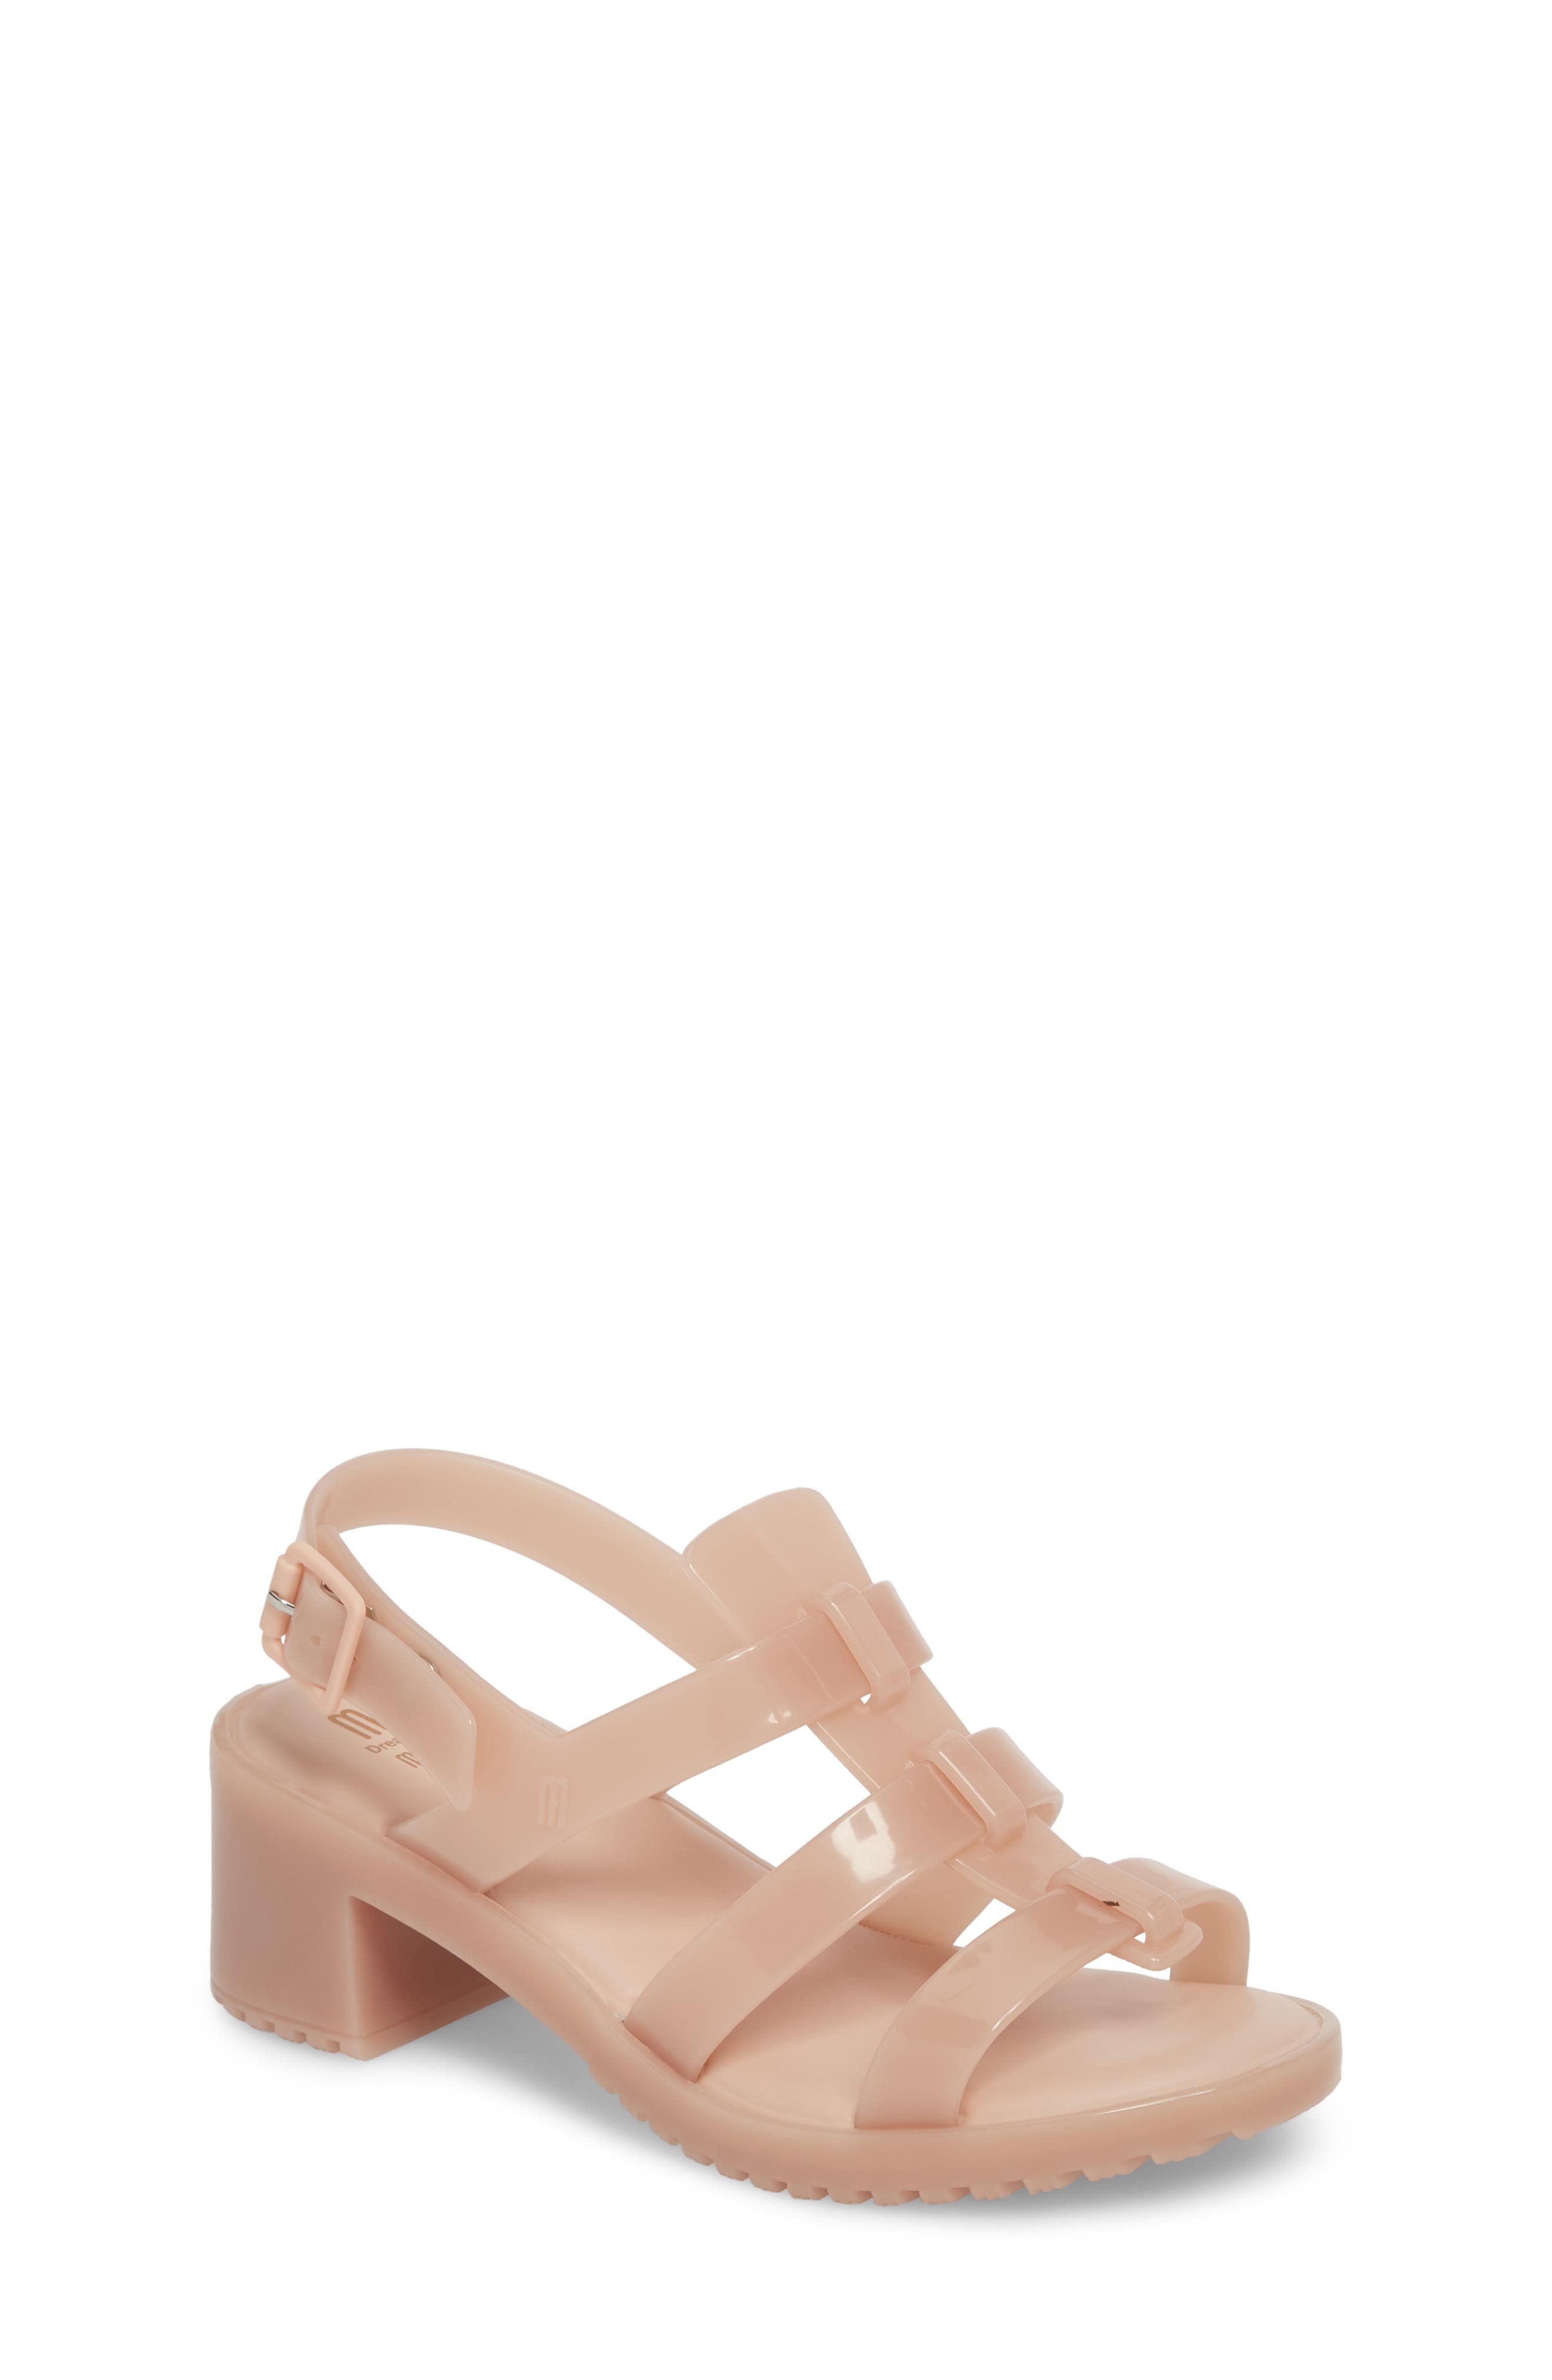 'Flox' Sandal,                         Main,                         color, Light Pink Matte